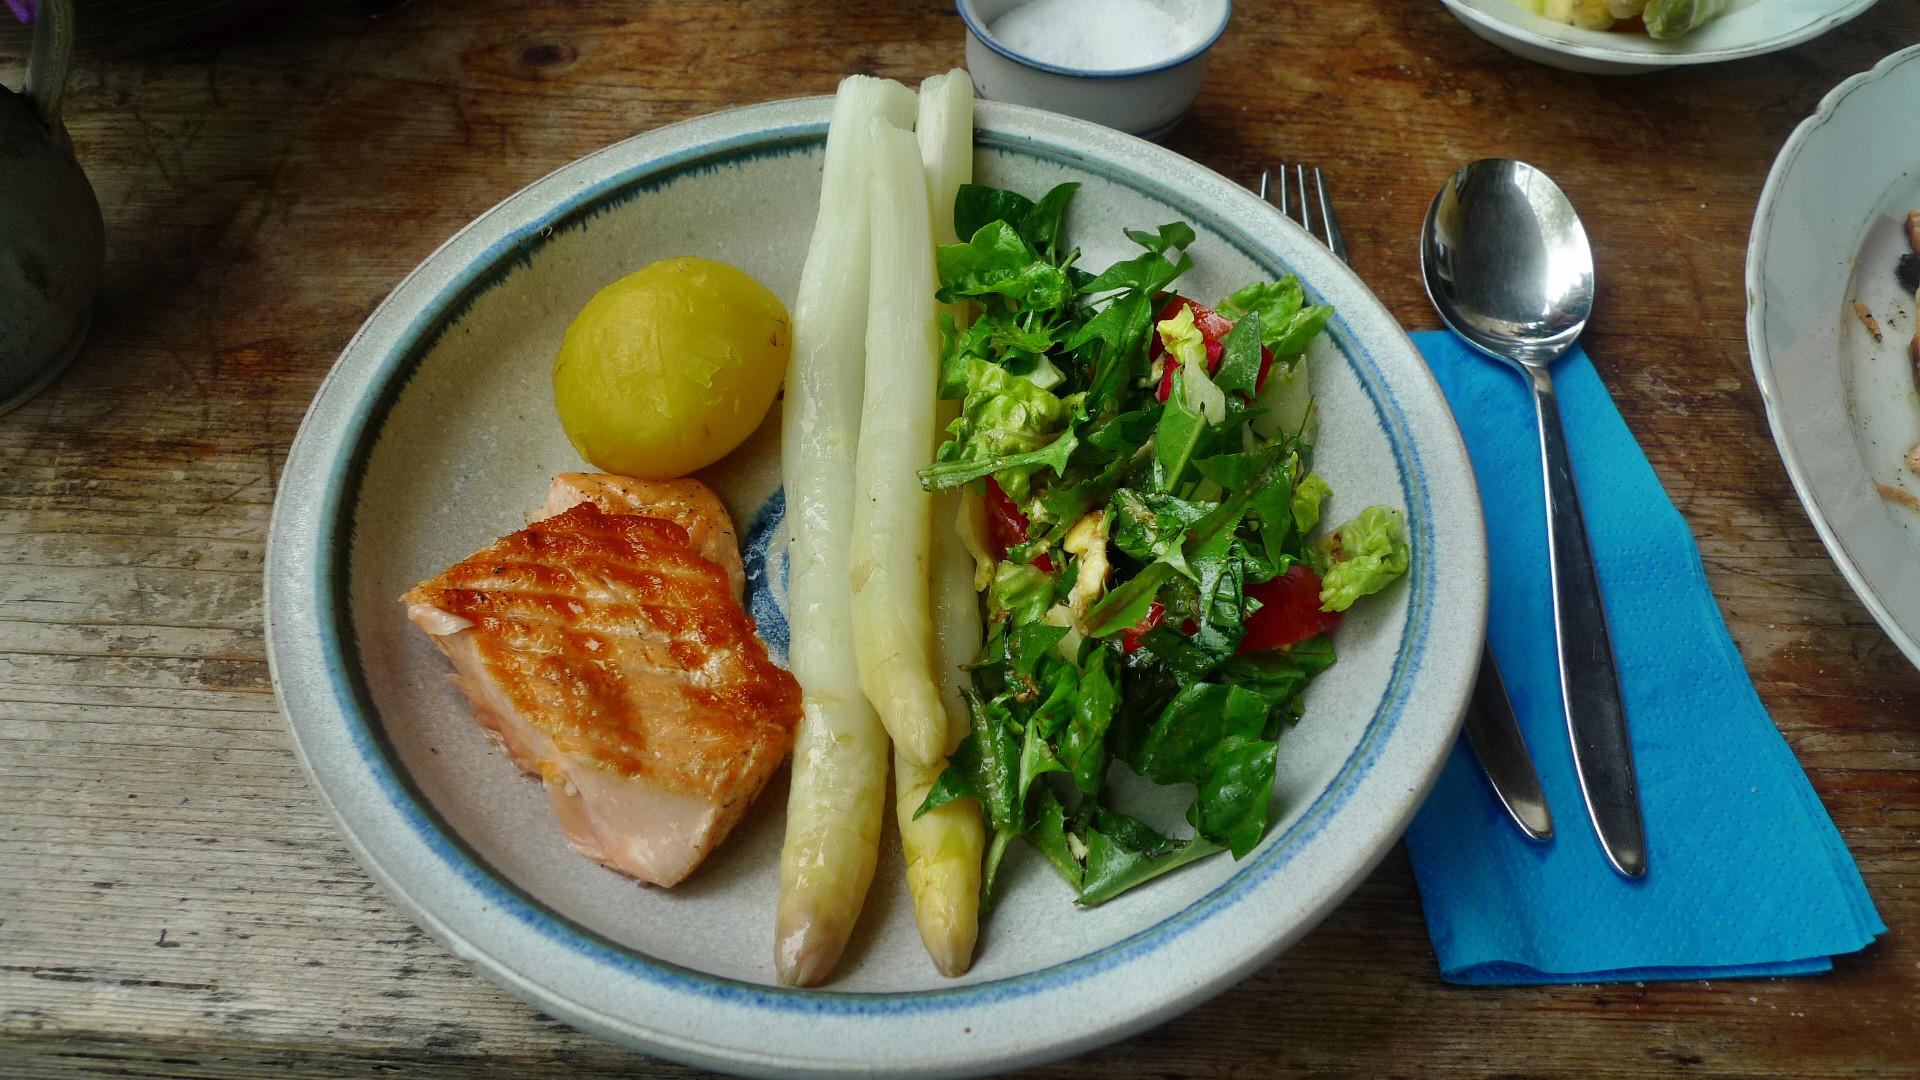 Lachs,Spargel,Salat,Kartoffeln - 25.4.15   (12)